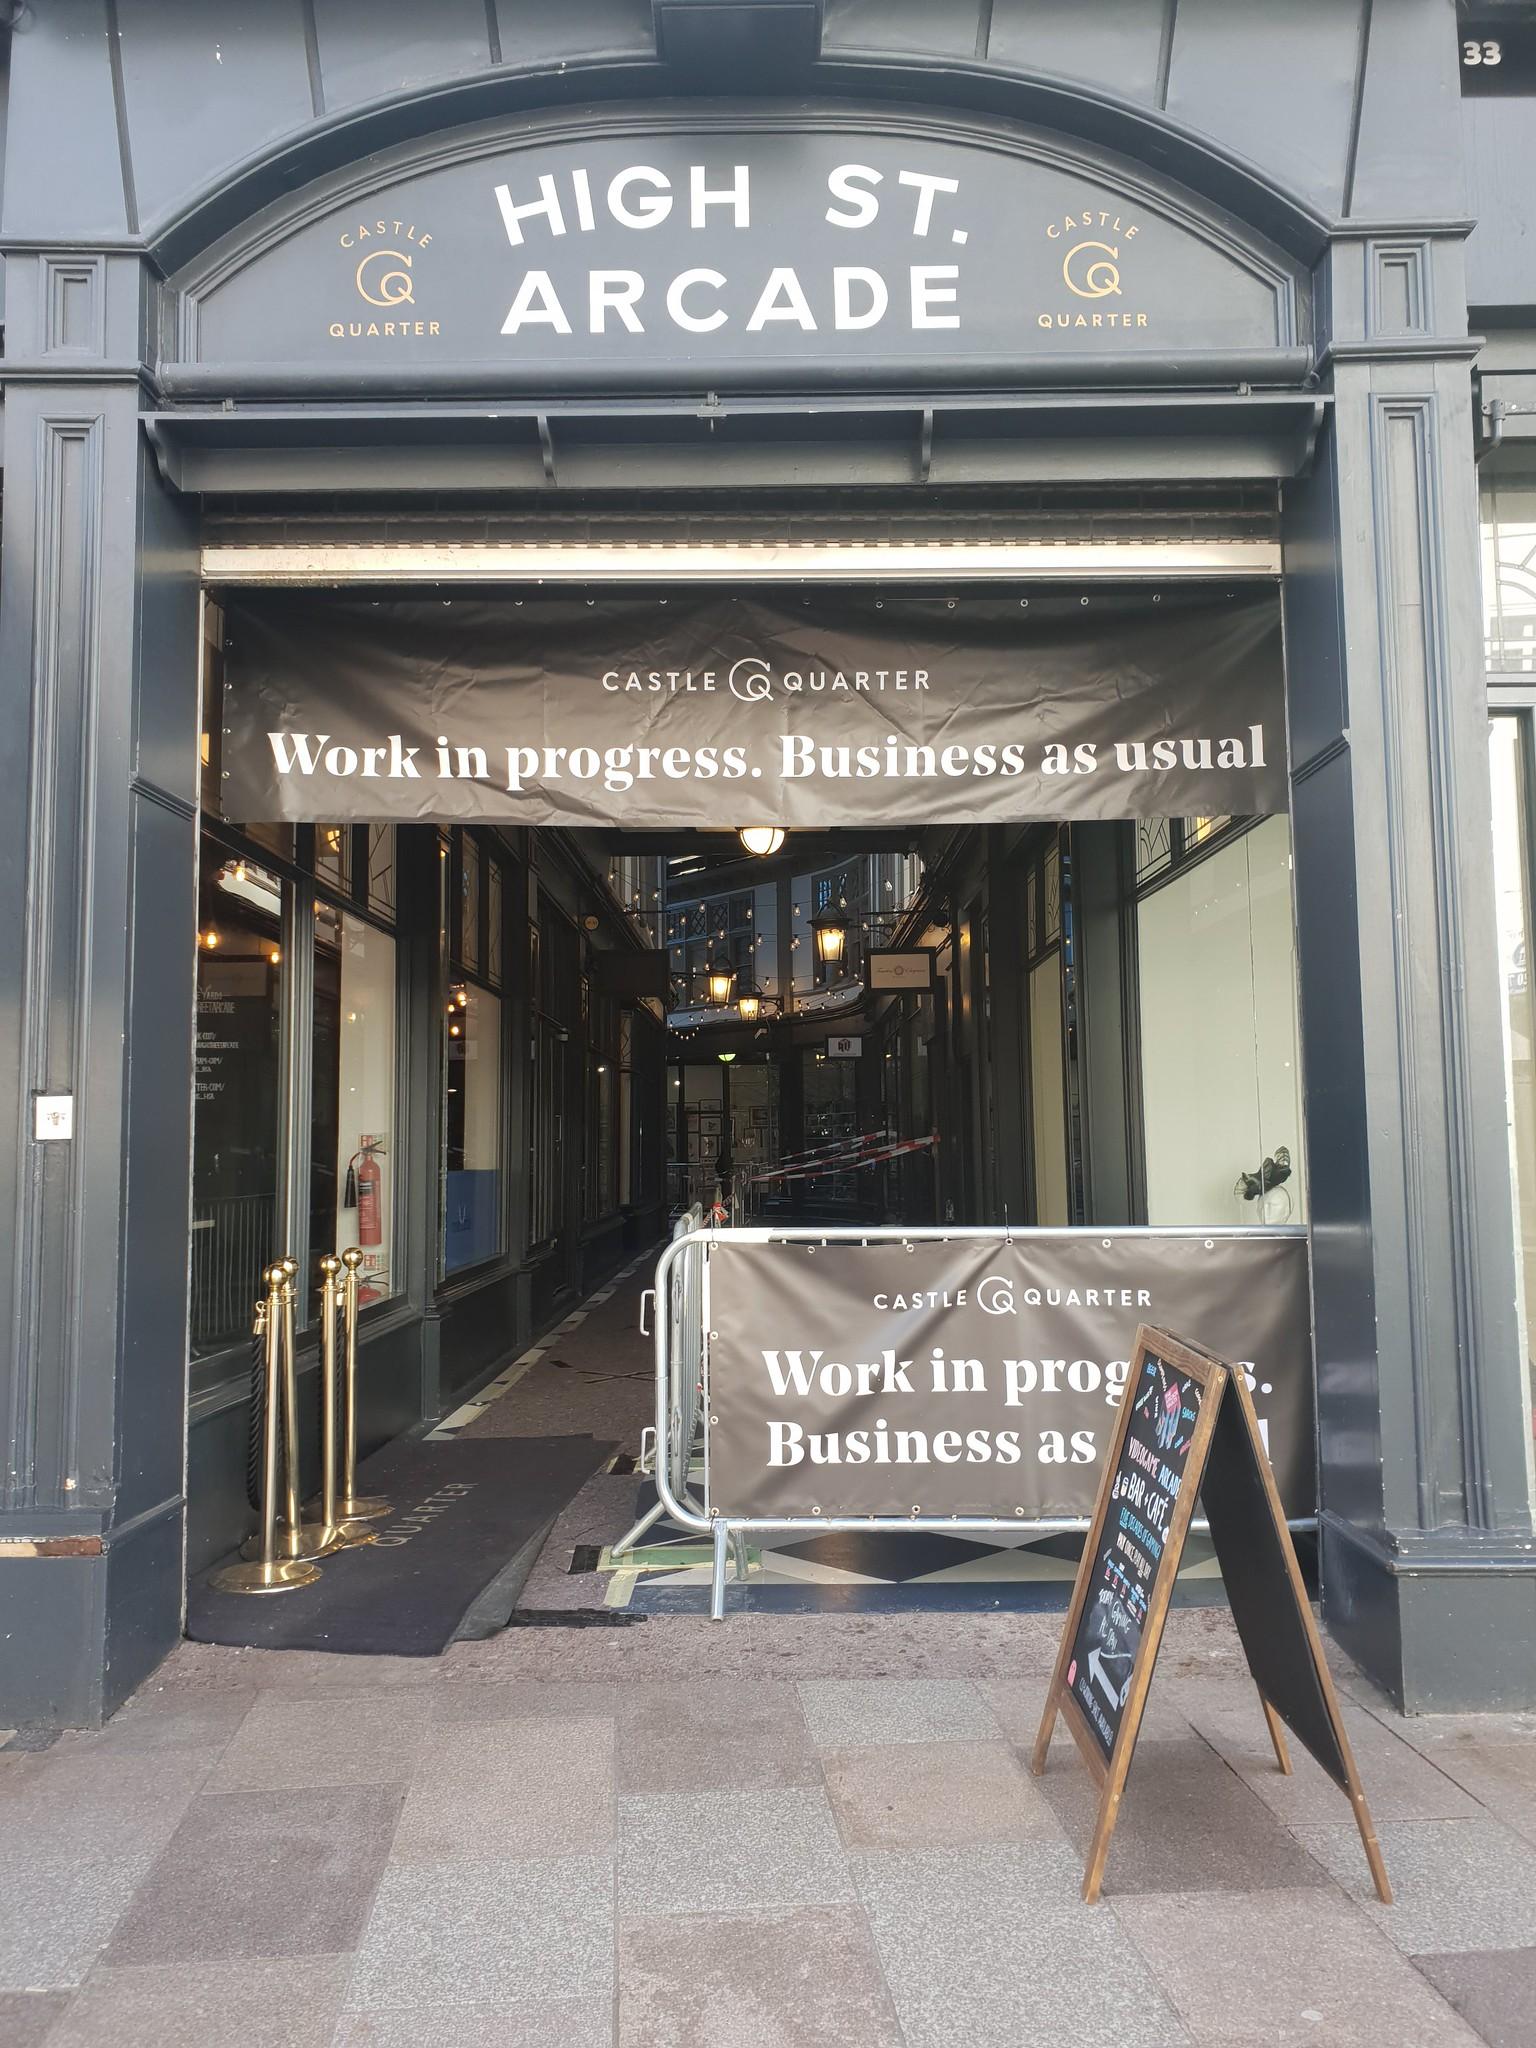 Kera, High Street arcade, Cardiff